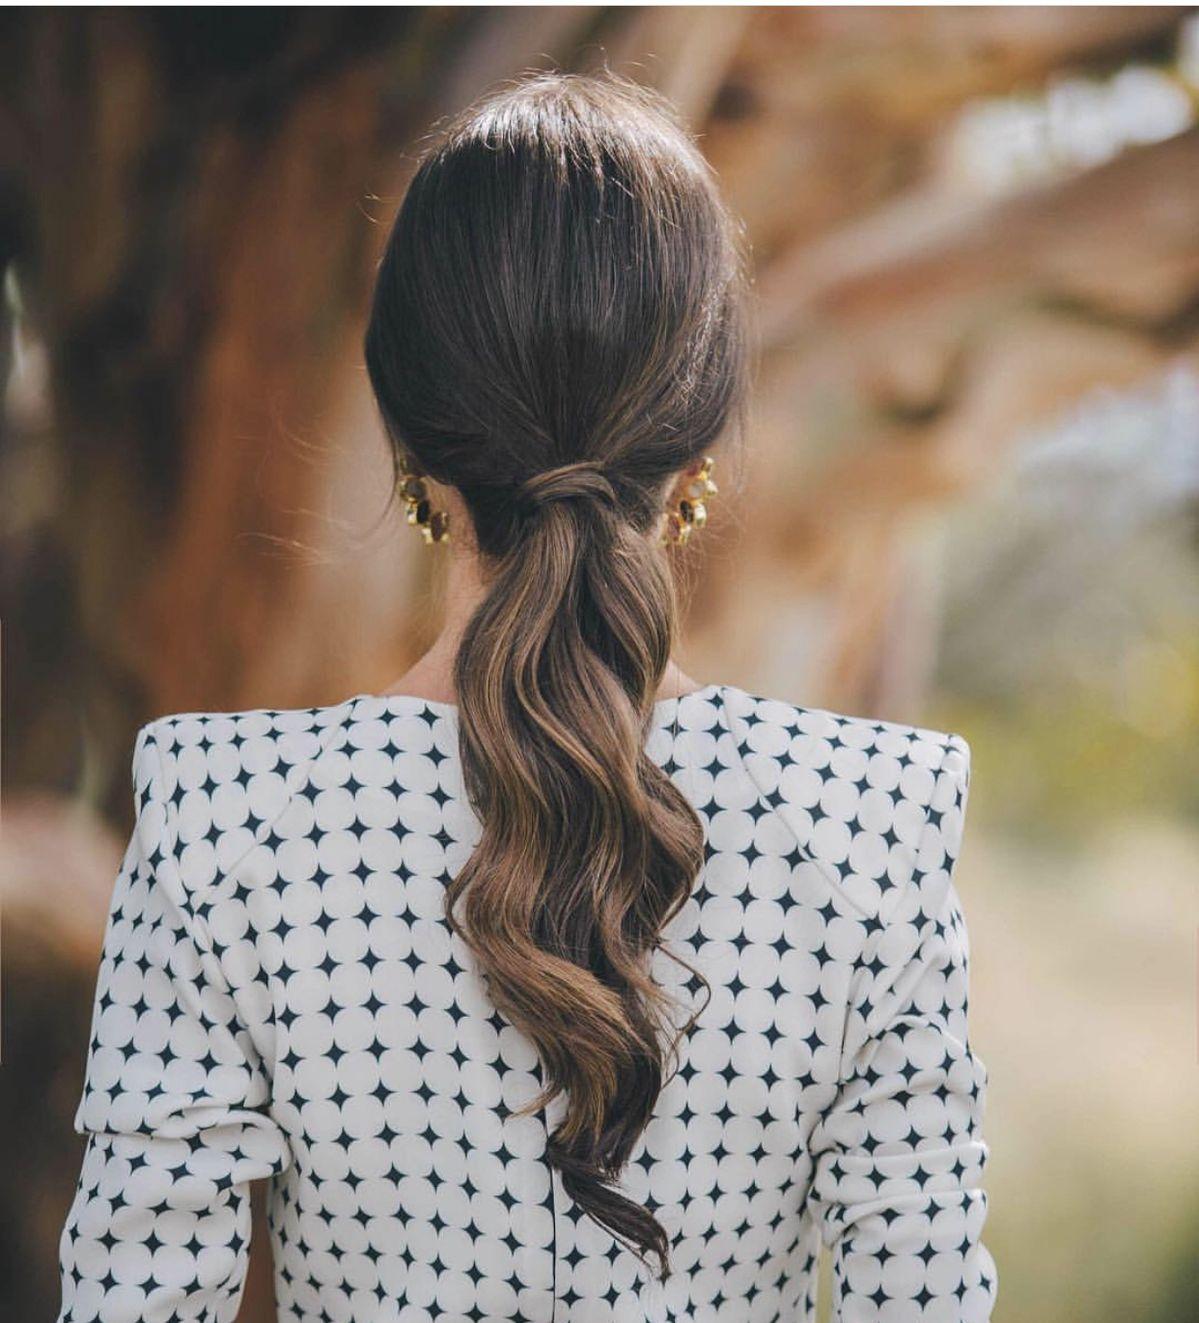 Hair Inspiration 2019-06-27 18:01:25